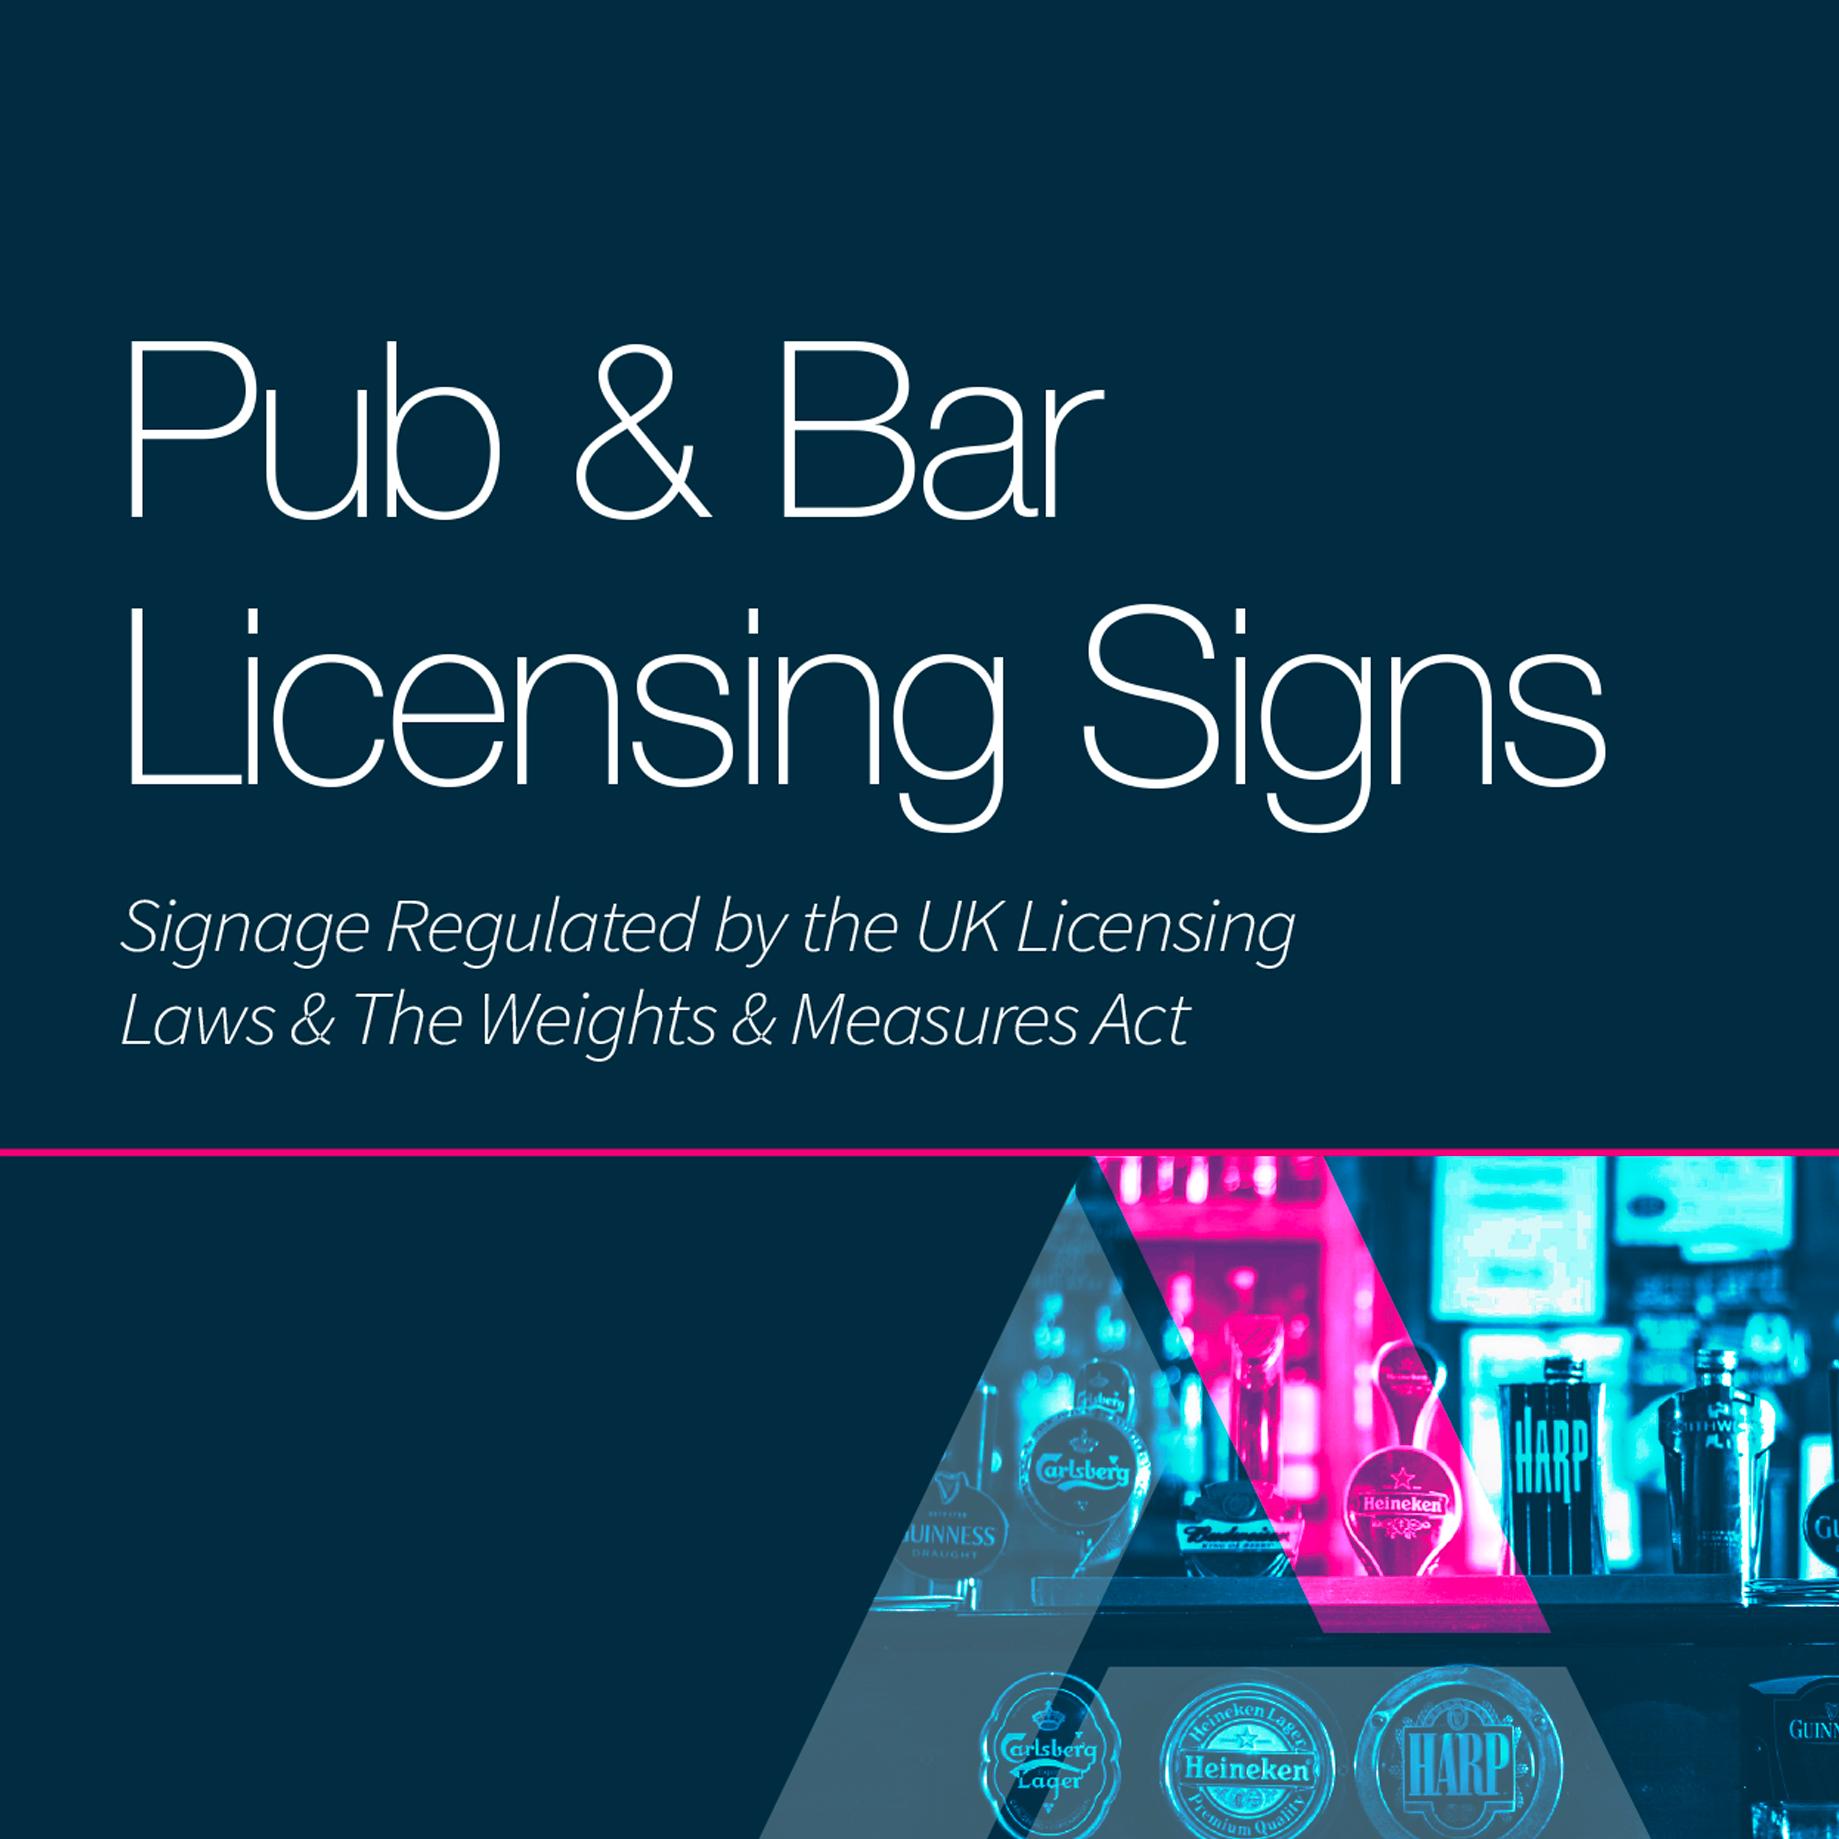 Pub licensing signs